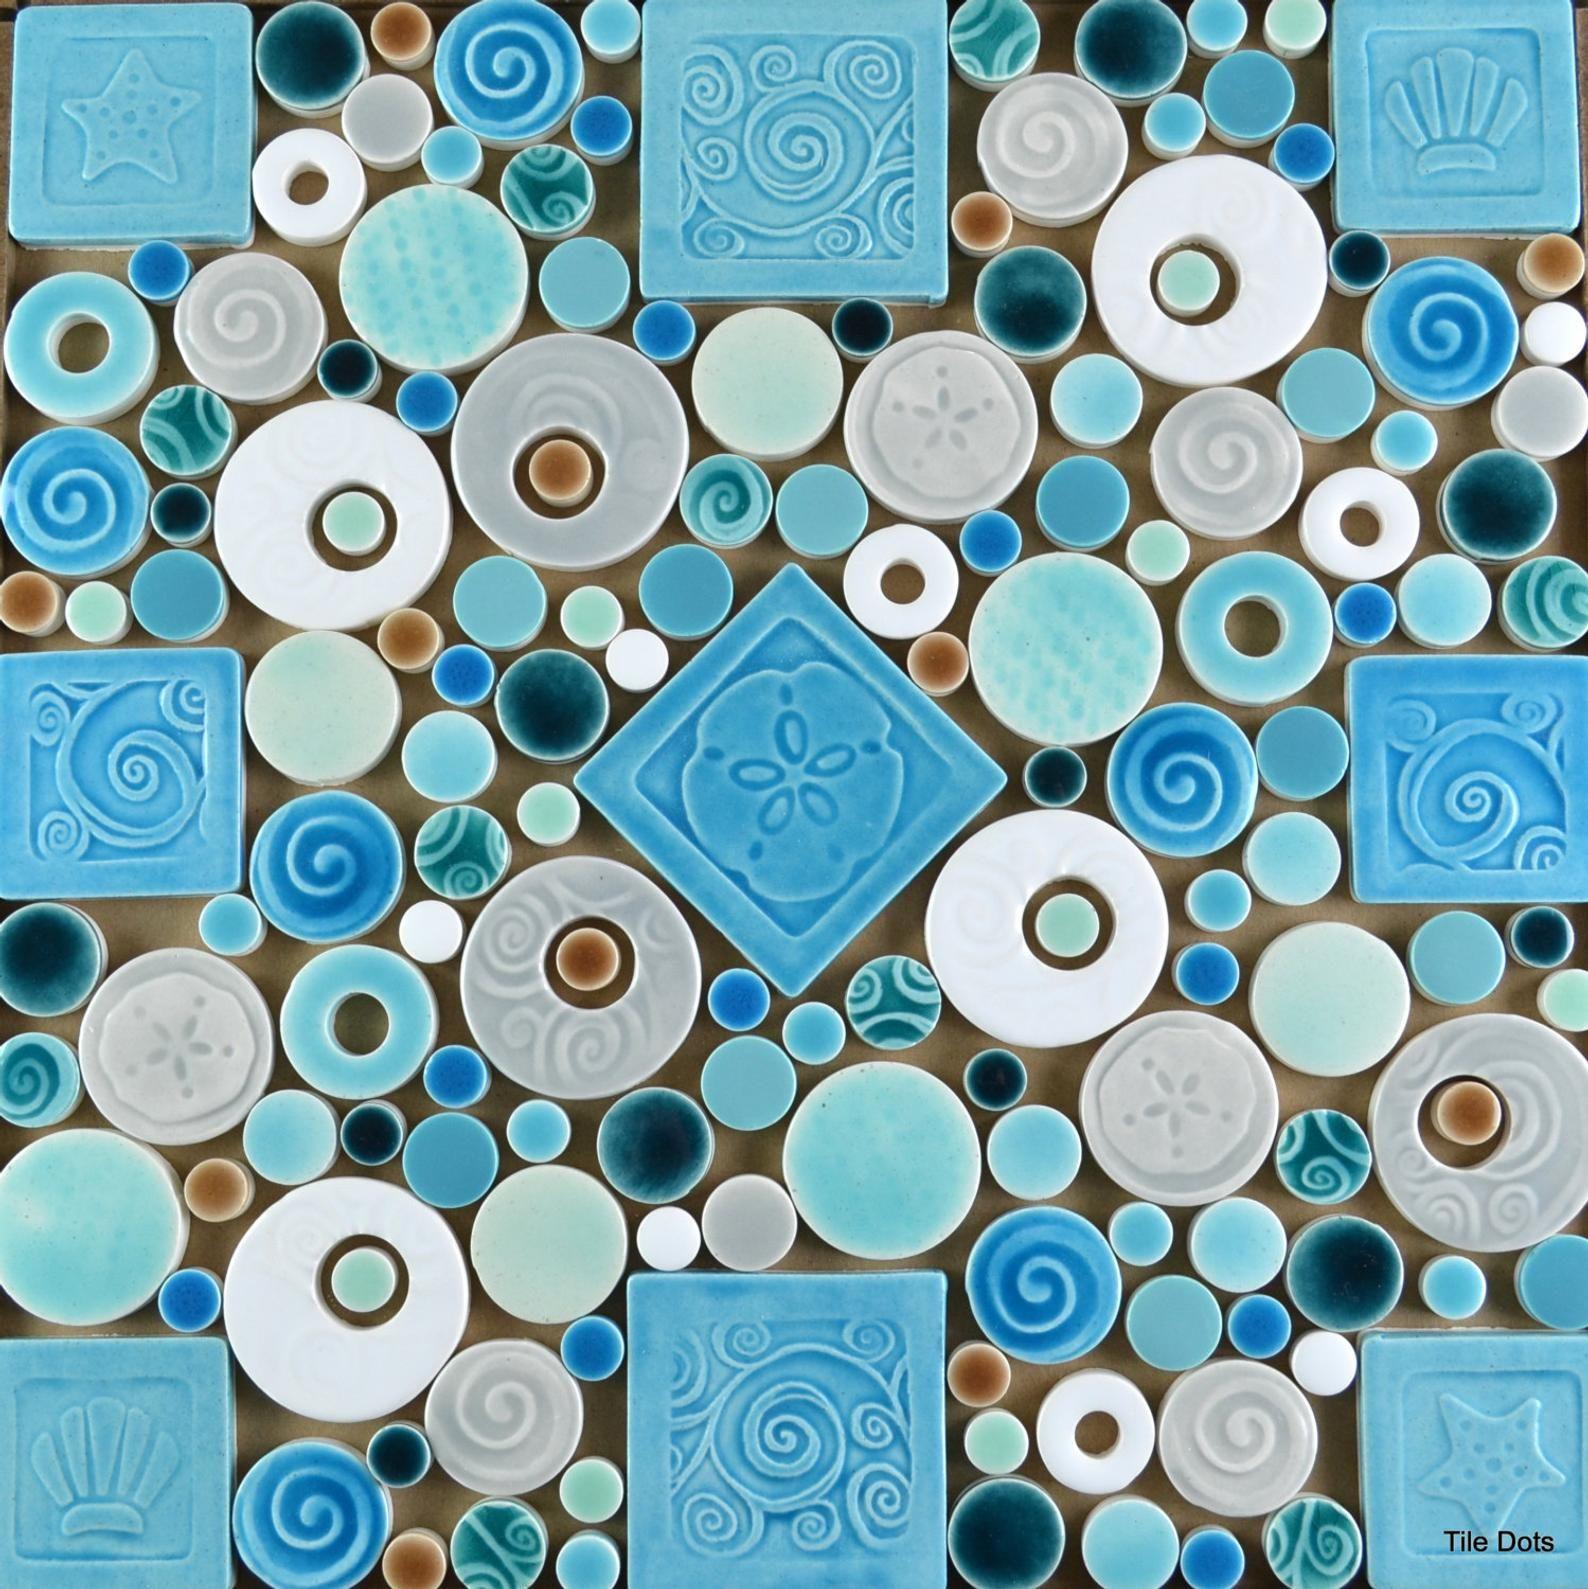 Seaside Dots Handmade Ceramic Tile Mosaic Ready To Install 12